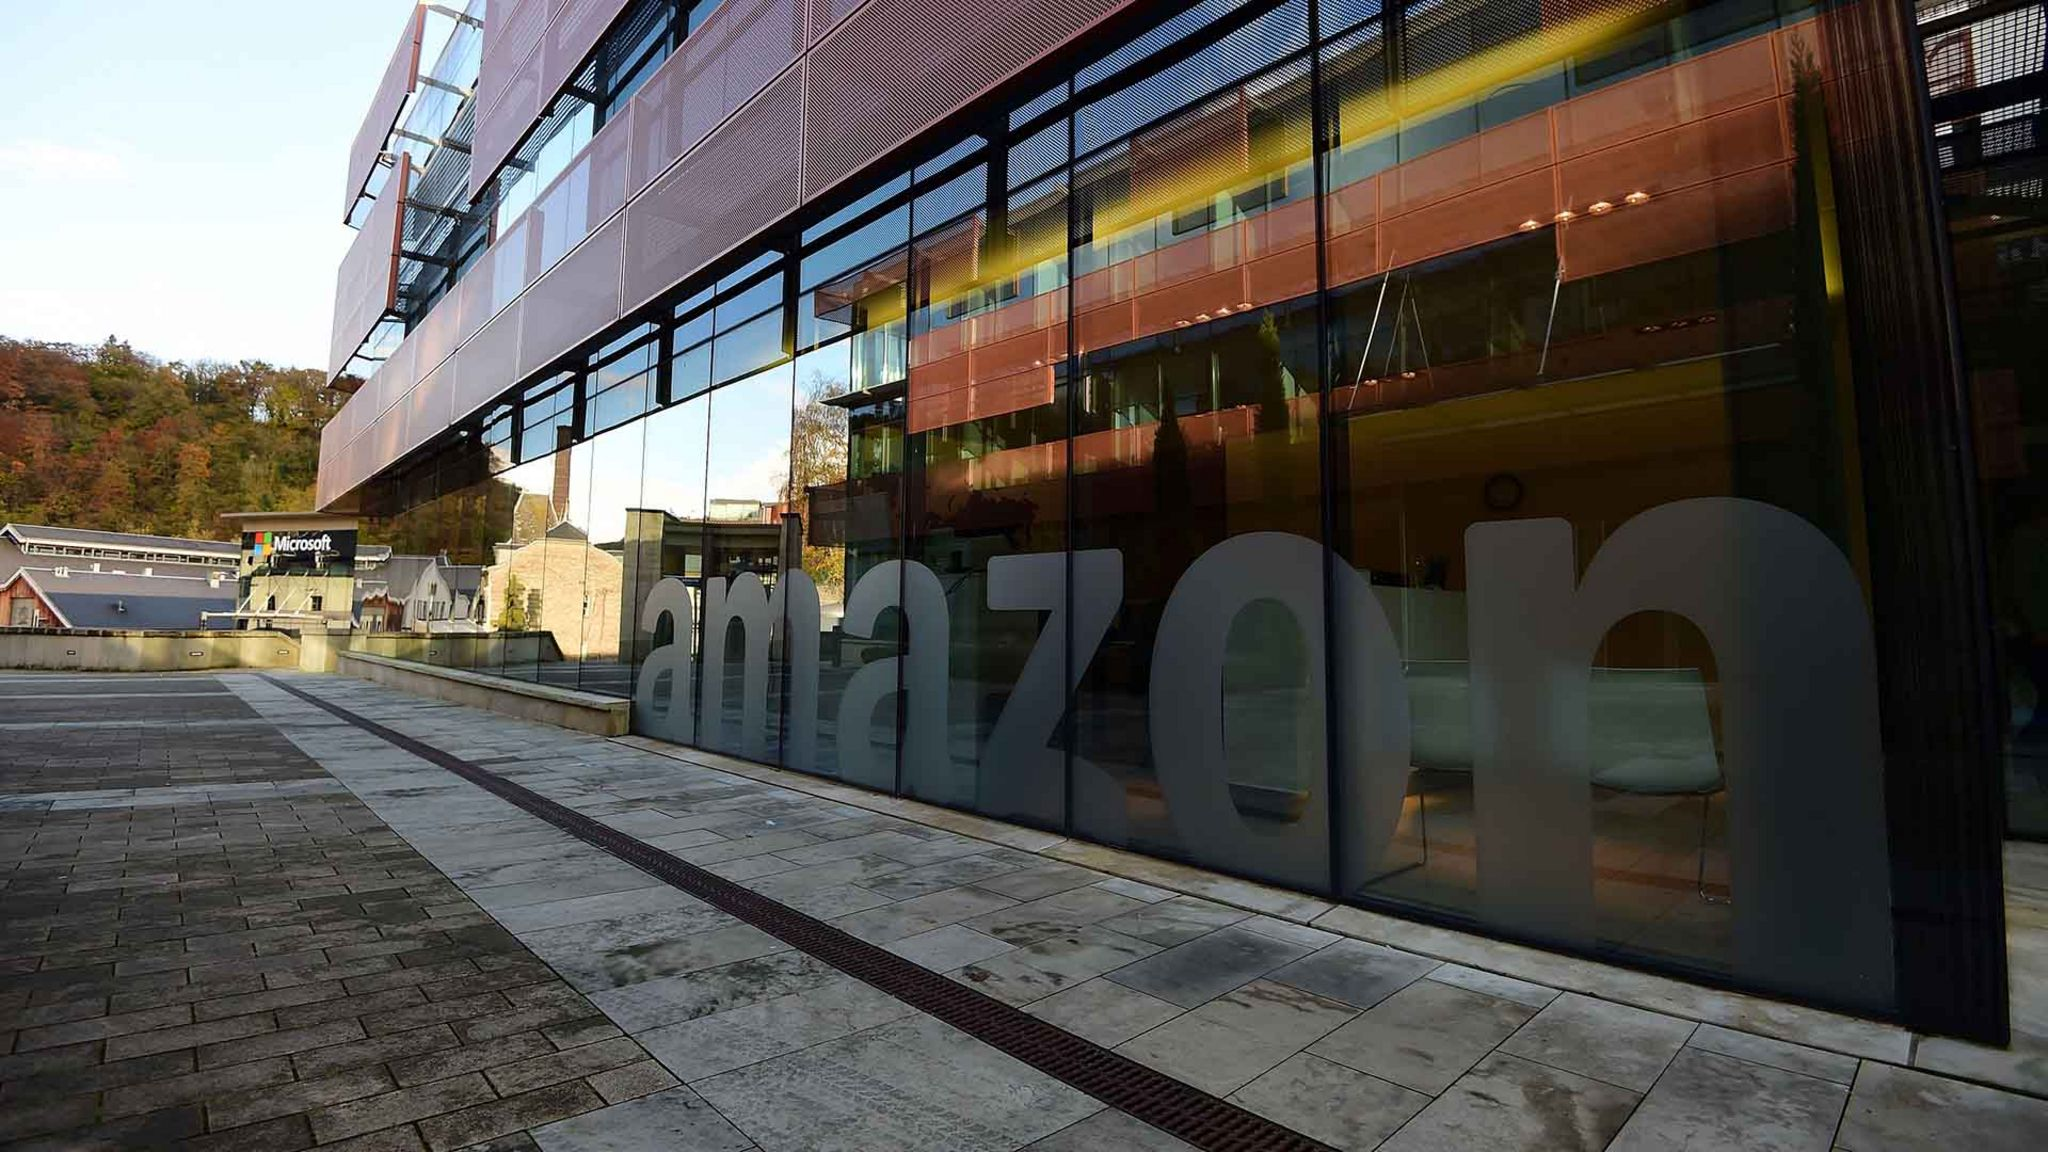 Amazon's headquarters in Luxembourg